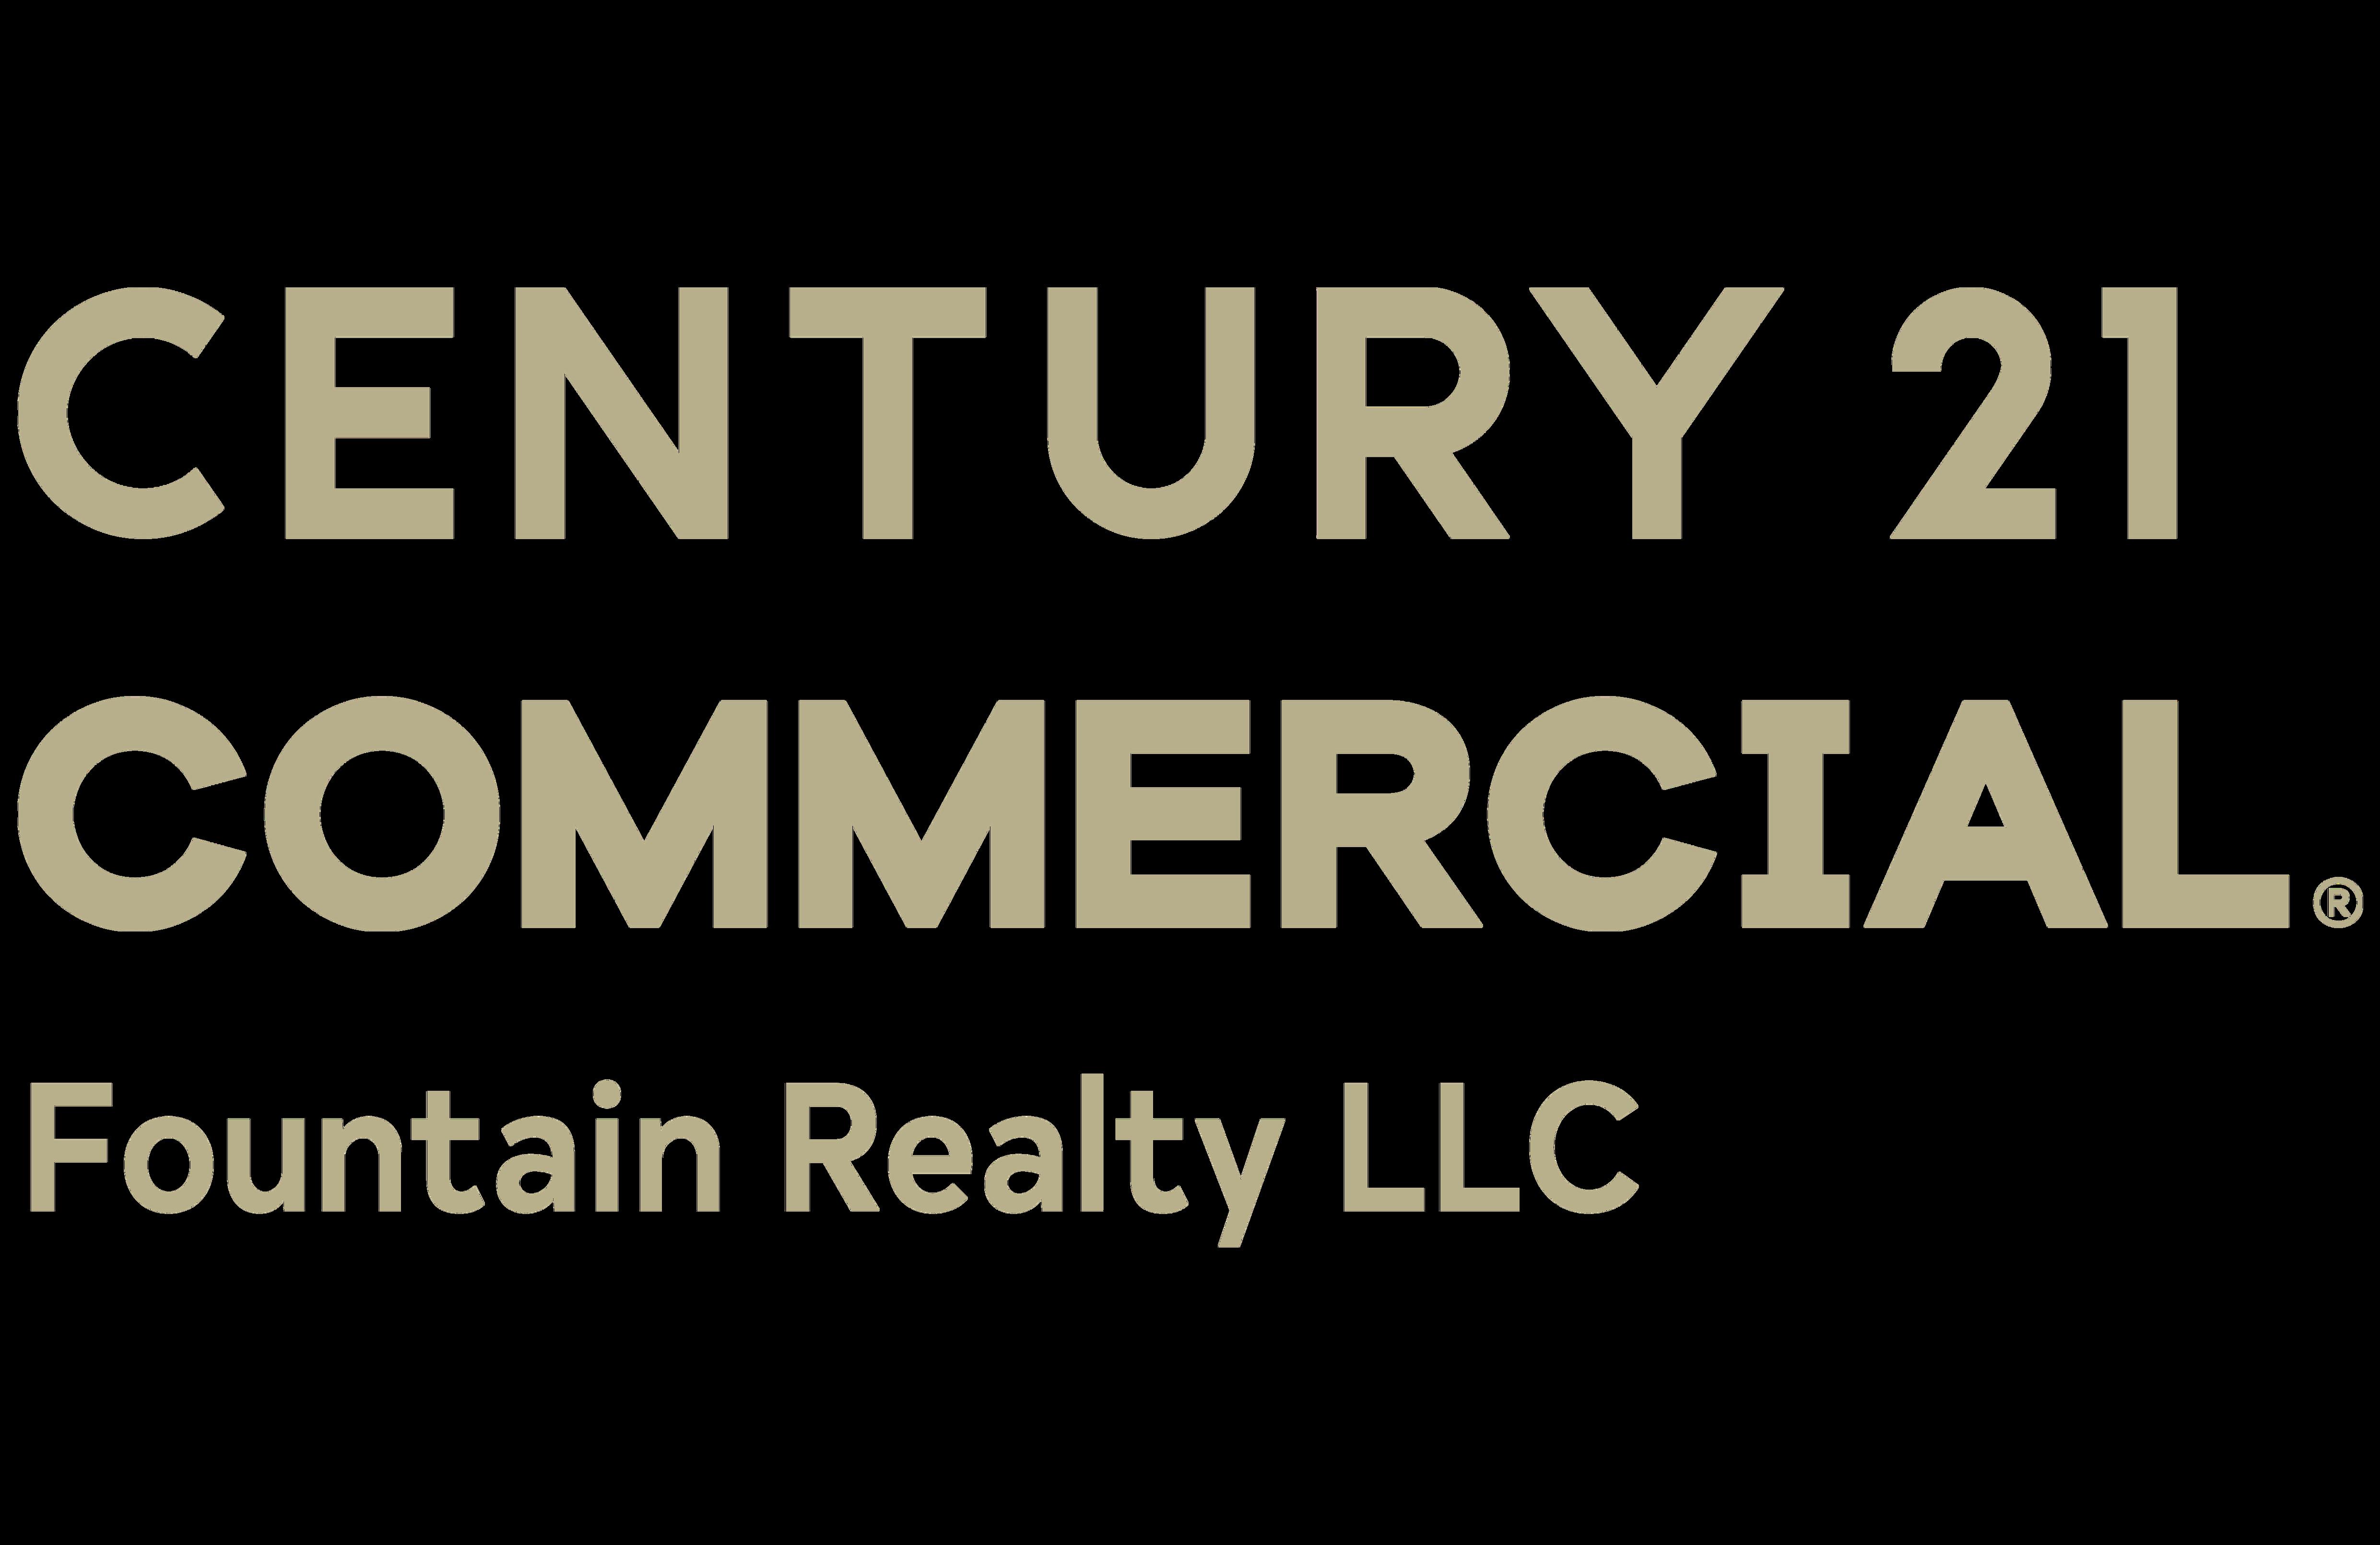 CENTURY 21 Fountain Realty LLC